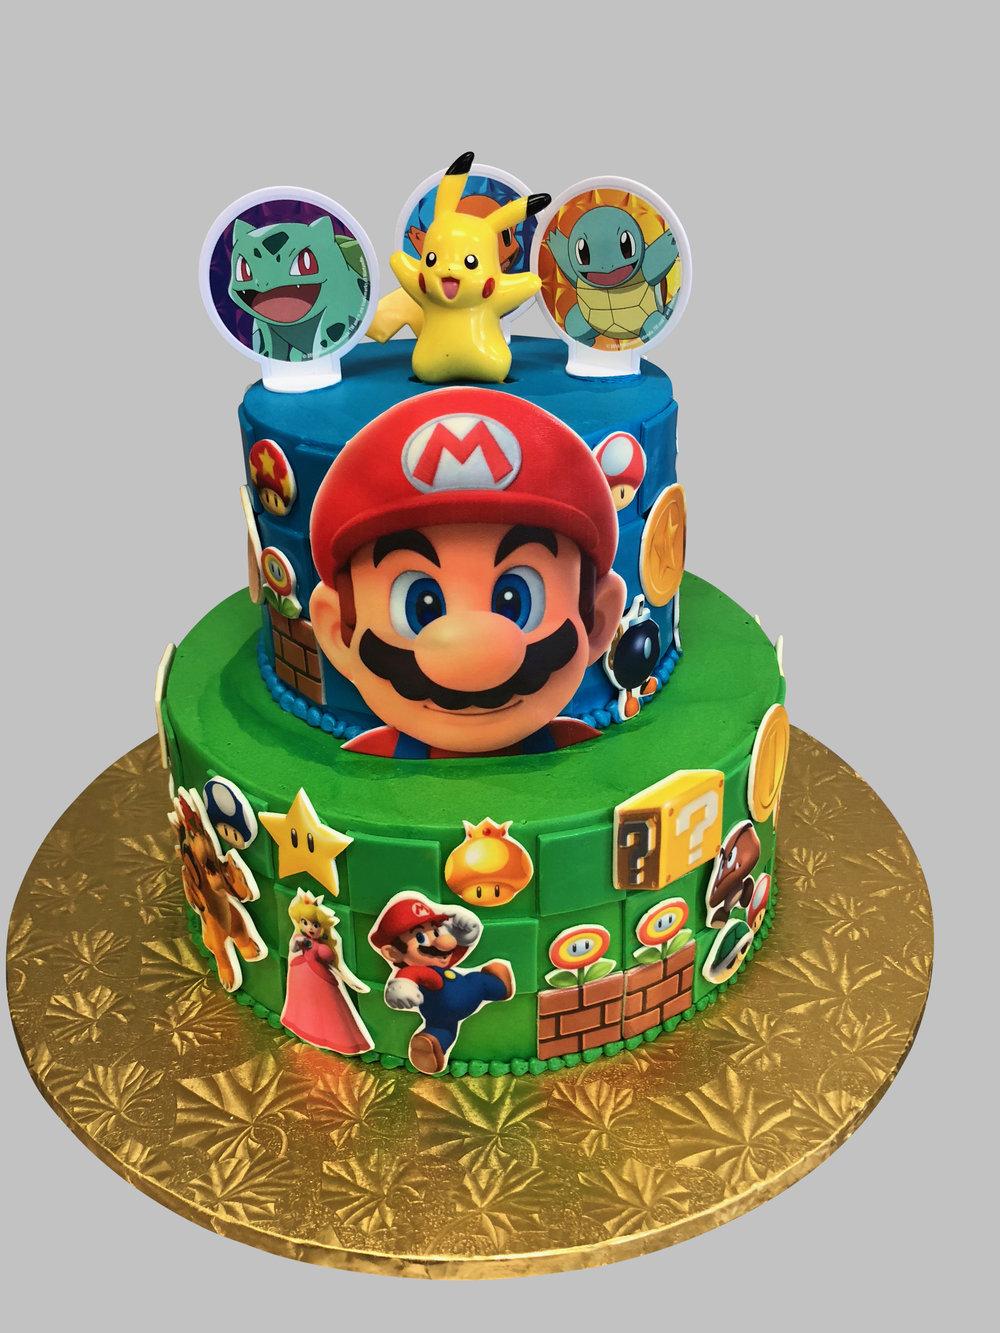 Swell Super Mario Birthday Cake Skazka Desserts Bakery Nj Custom Funny Birthday Cards Online Fluifree Goldxyz